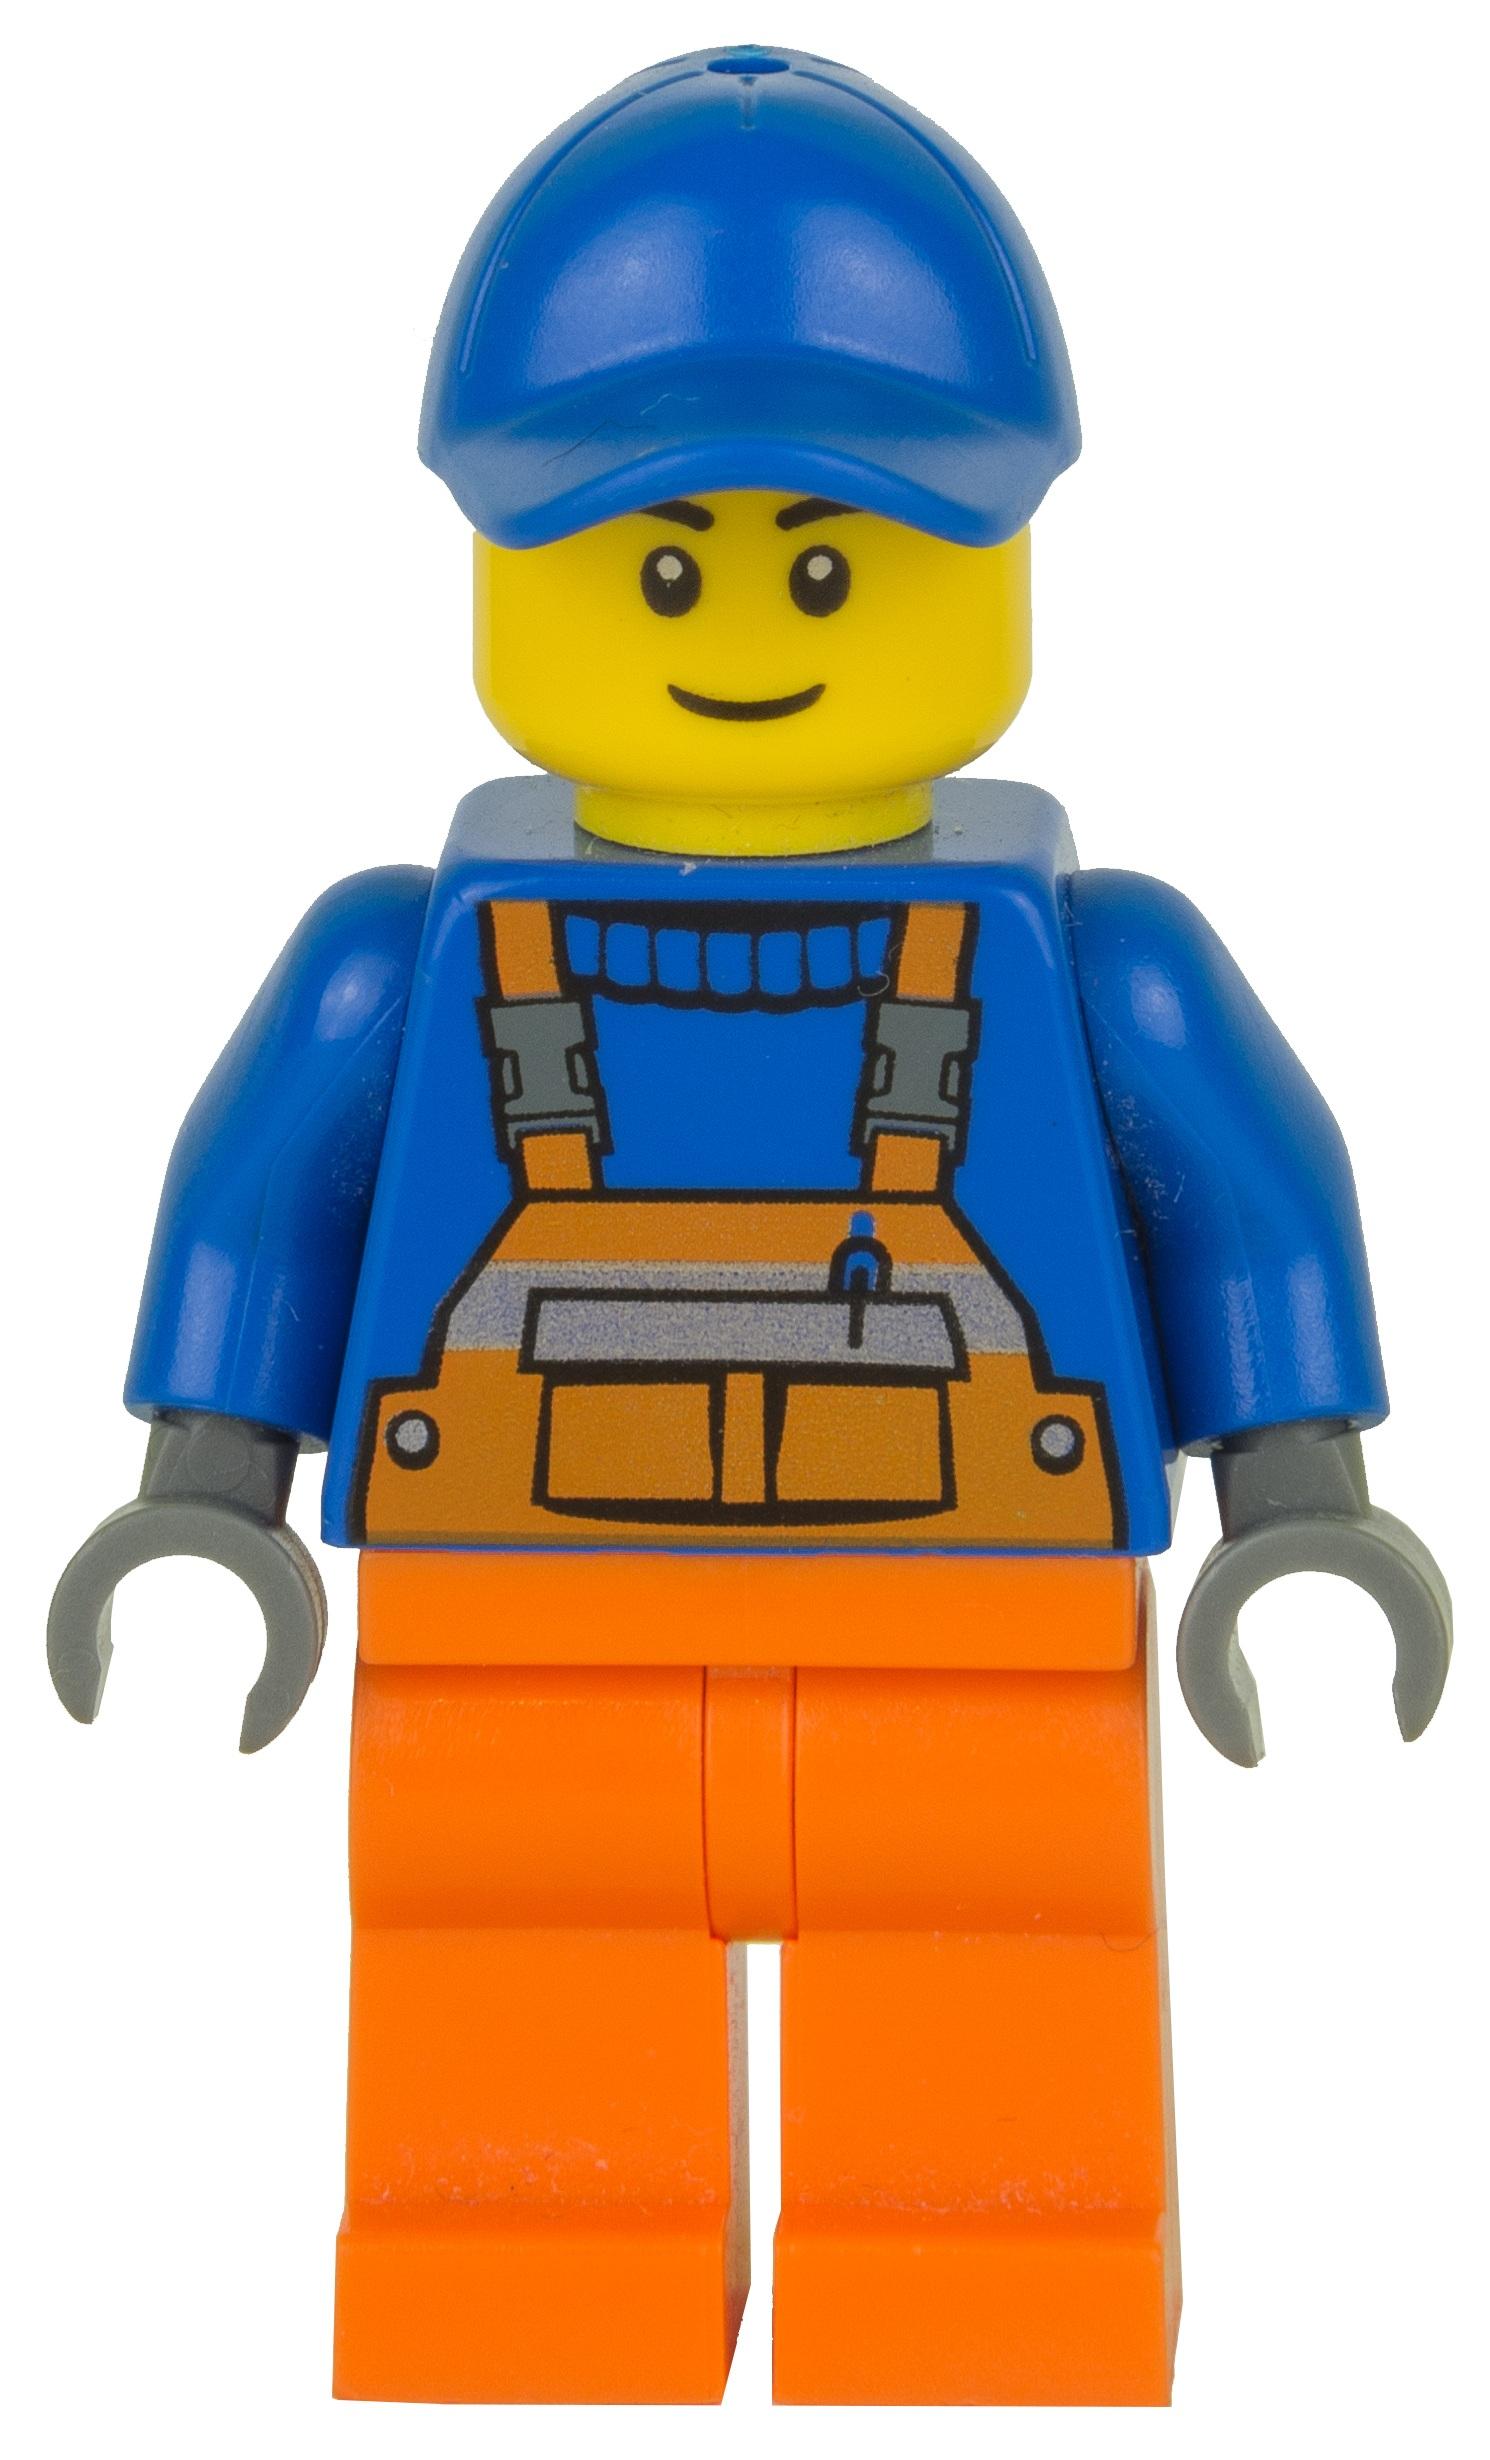 Gambar Bermain Mainan Arca Lego Action Figure Gambar Kartun